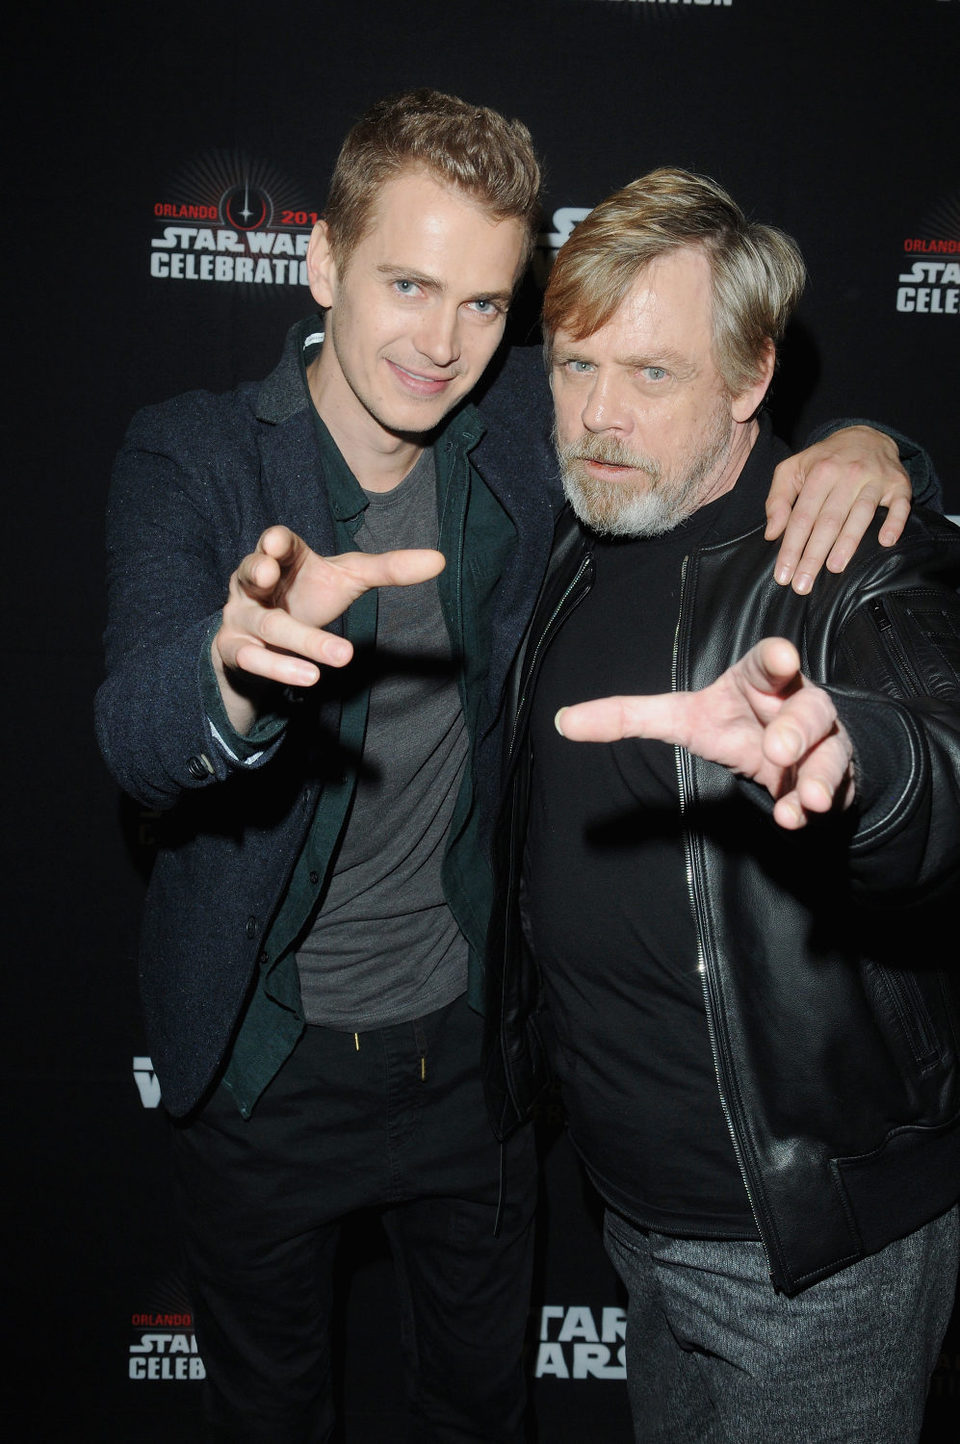 Mark Hamill y Hayden Christensen durante la Star Wars Celebration